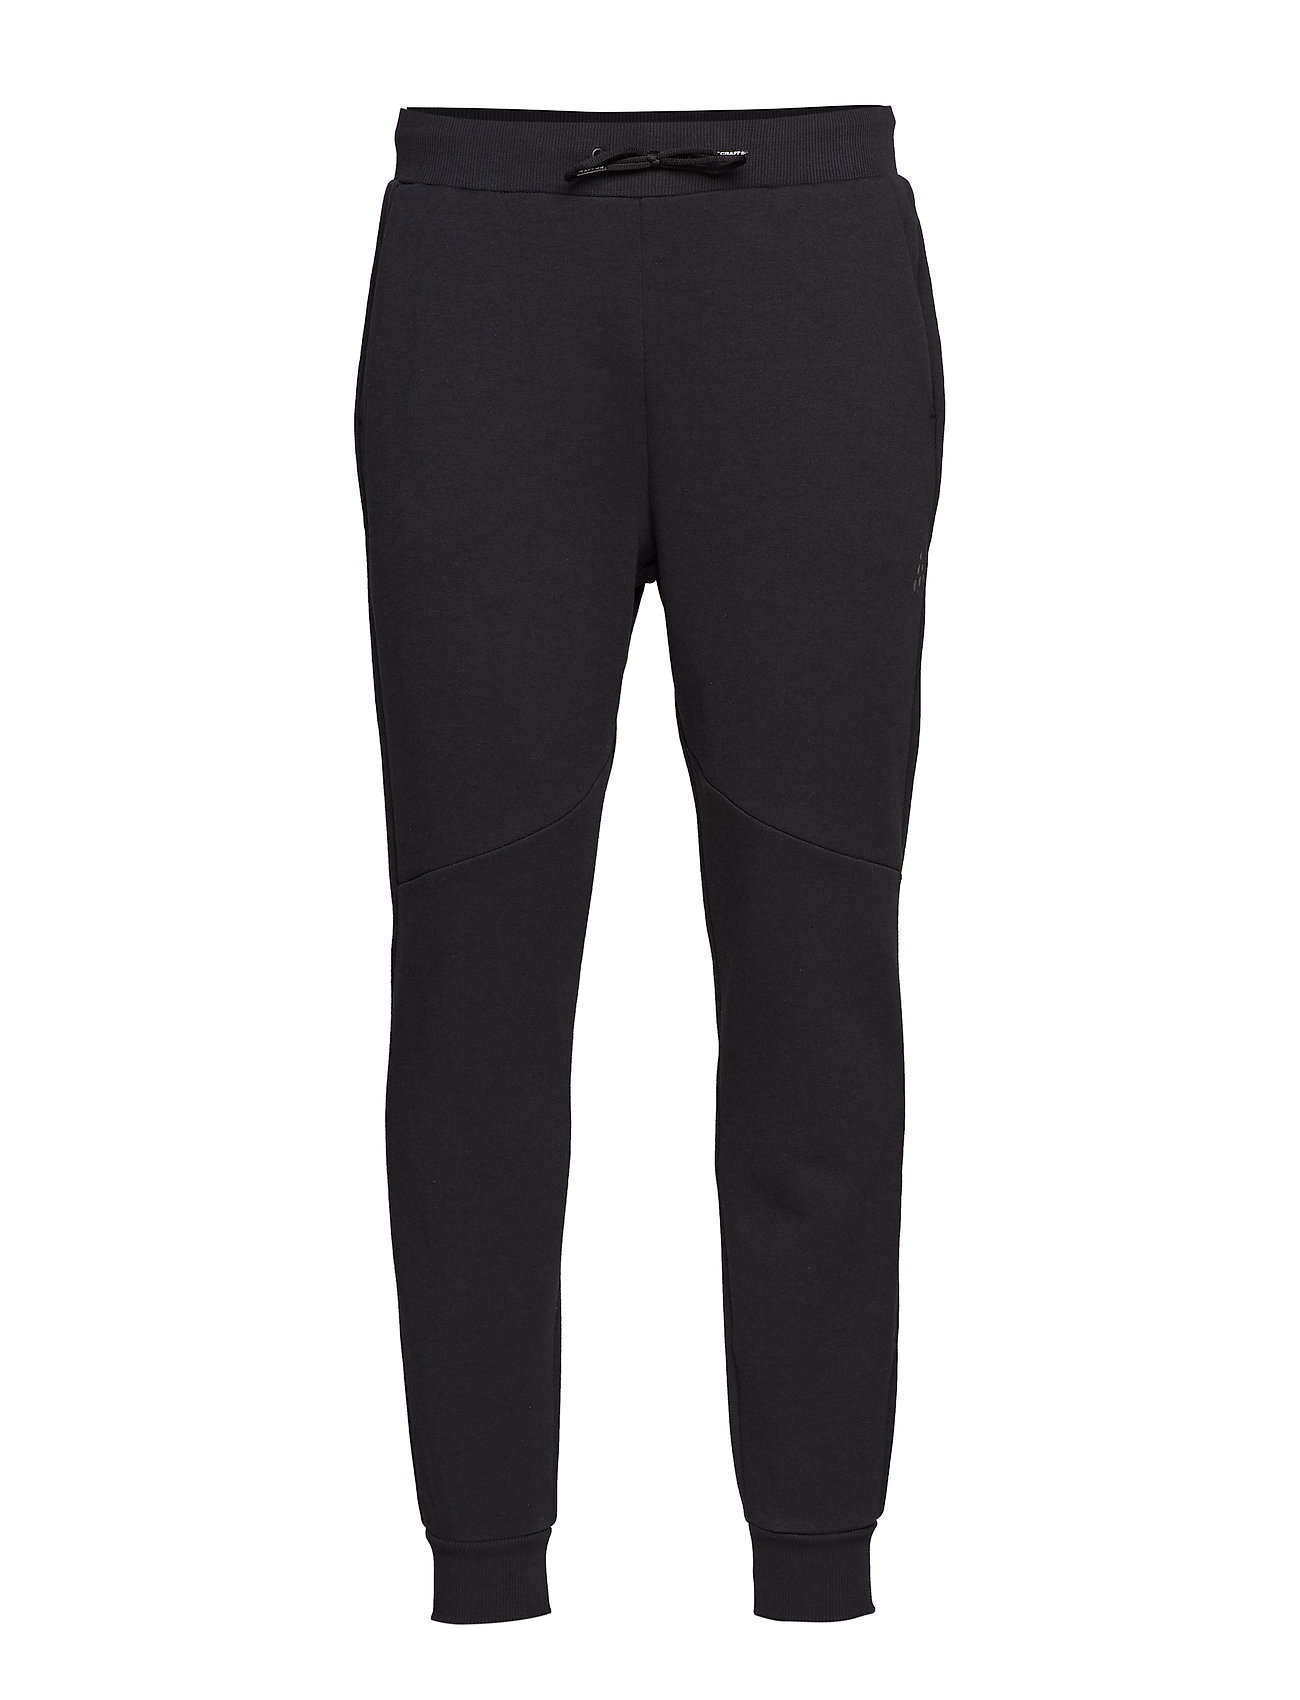 b6732bec District Crotch Sweat Pants M (Black) (£32.50) - Craft -   Boozt.com